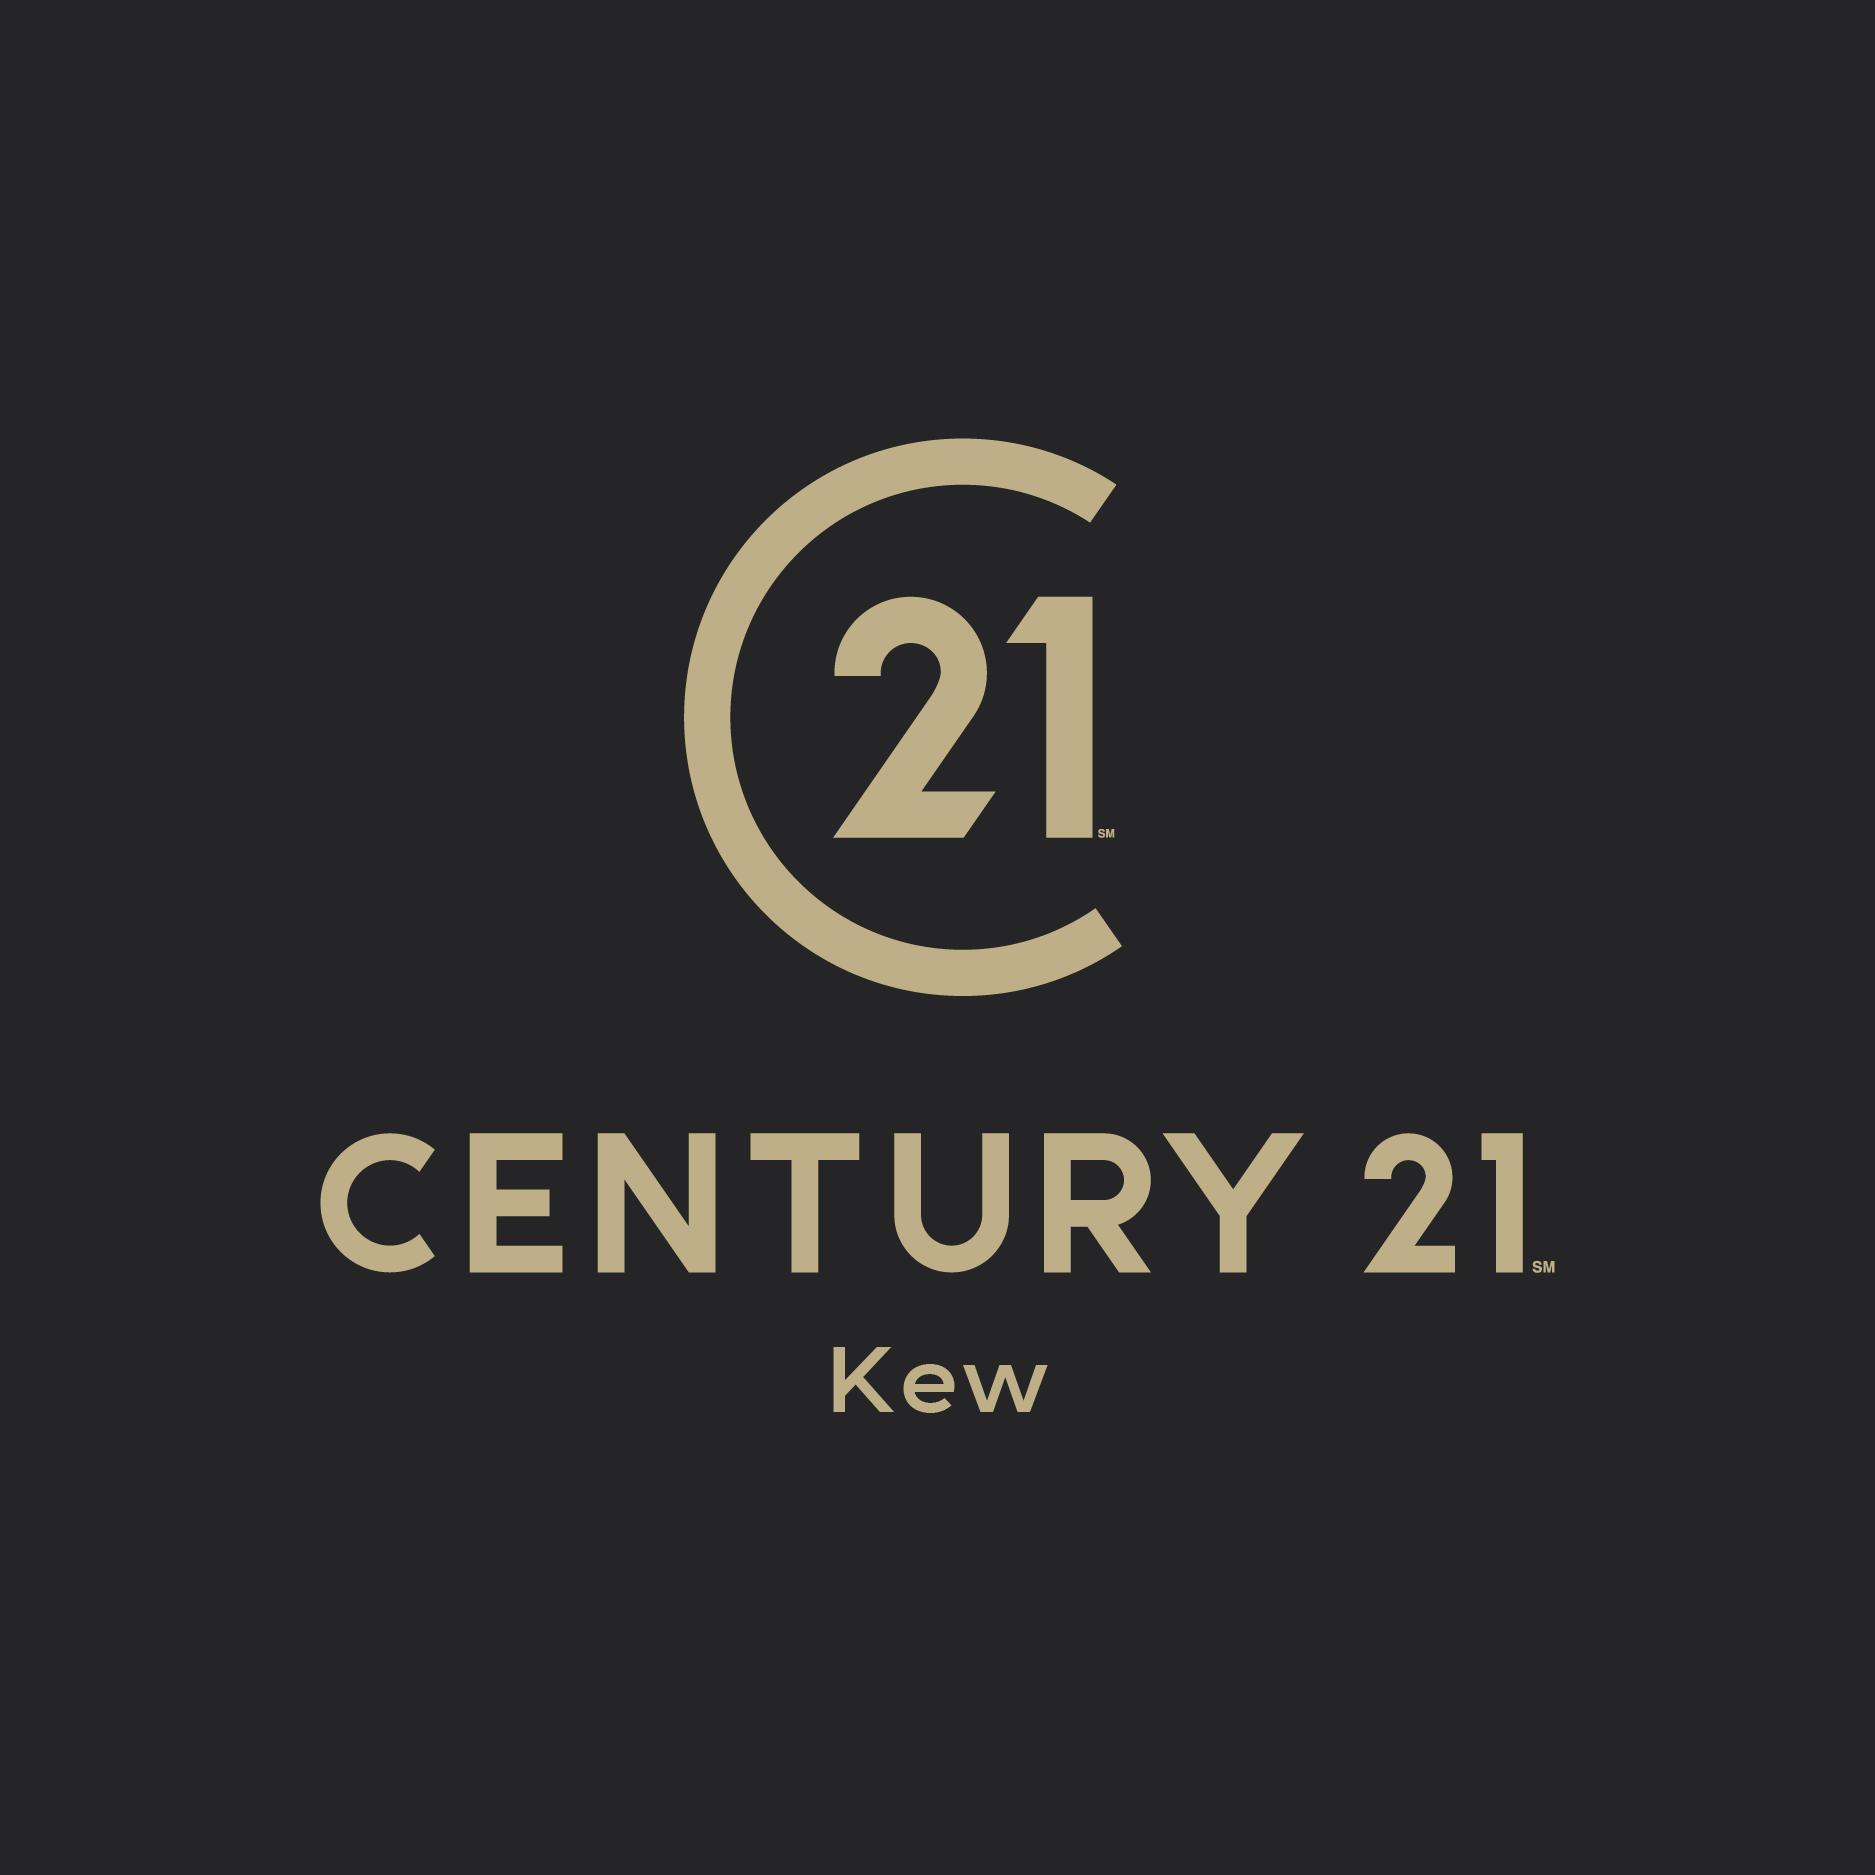 Century 21 - Kew